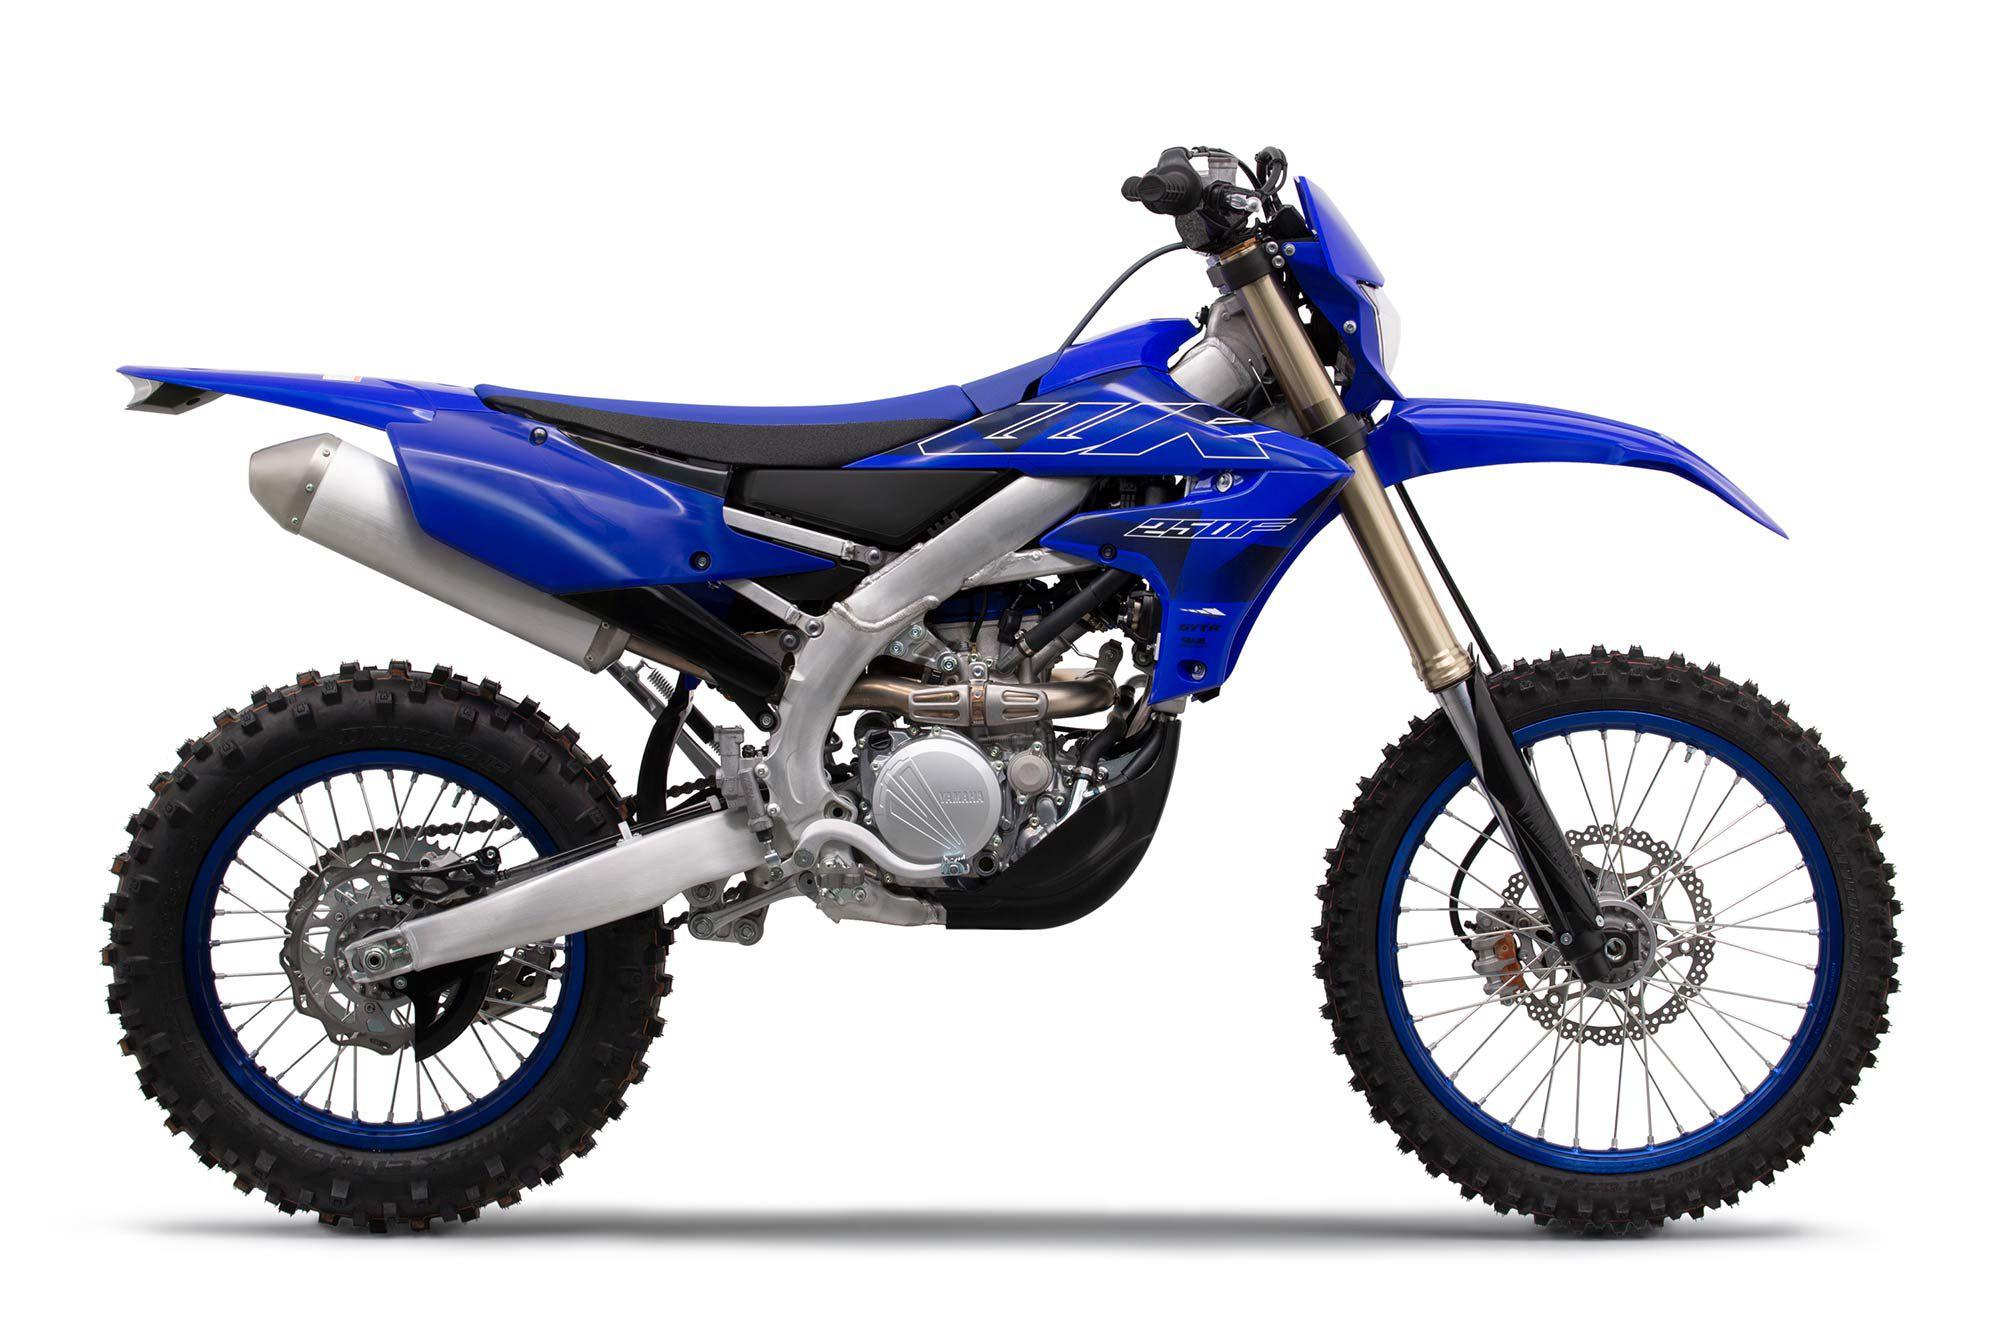 2022 Yamaha Enduro Motorcycles First Look